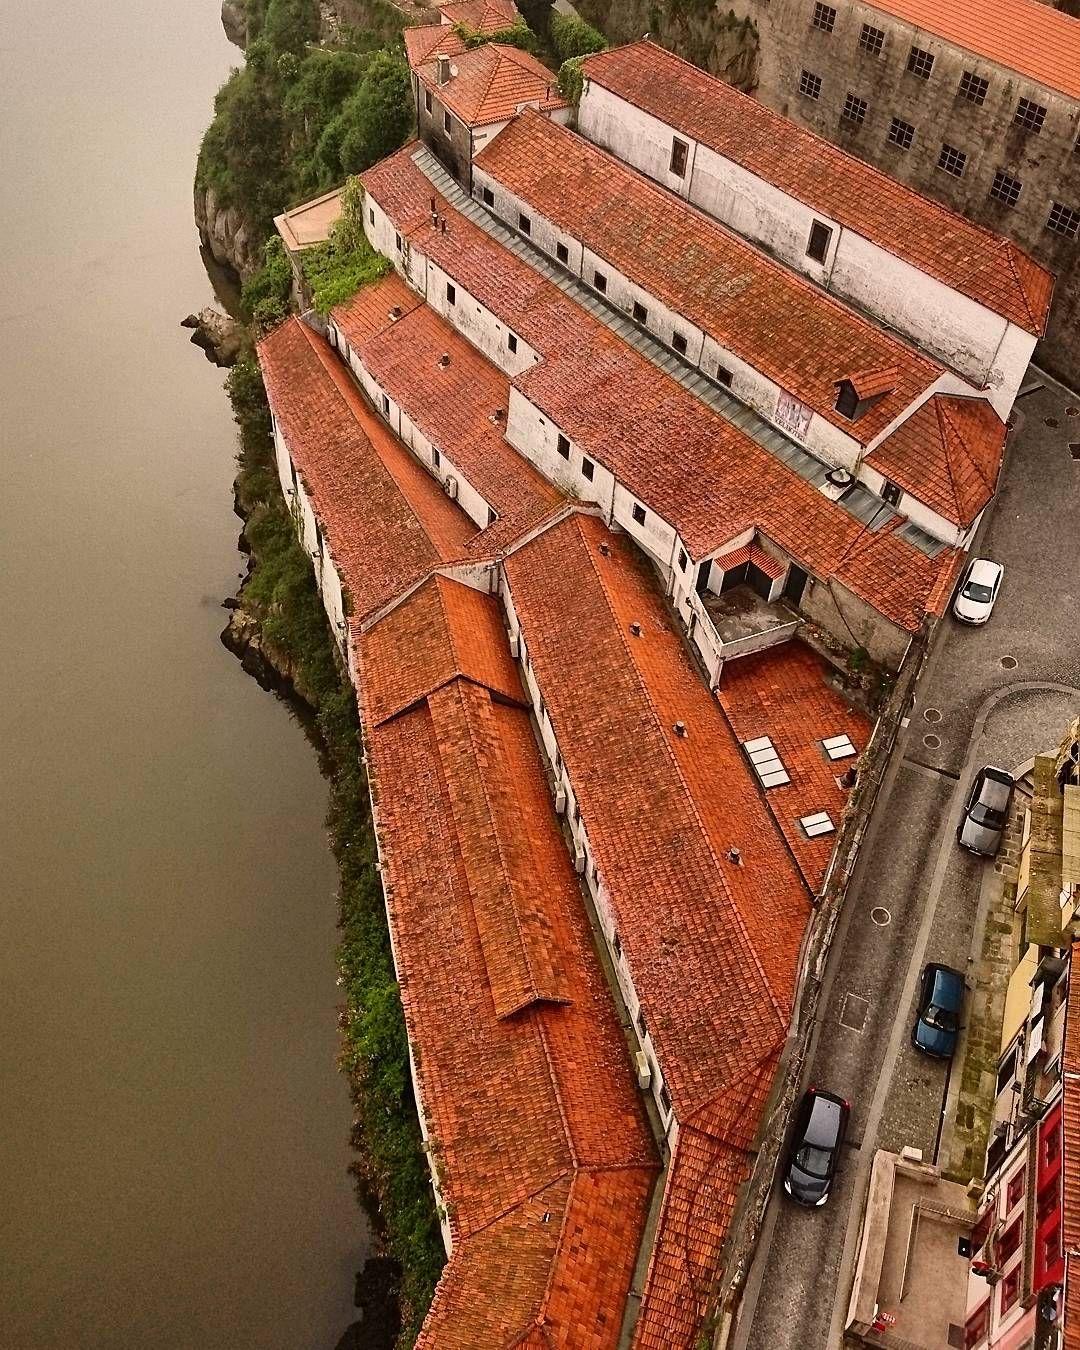 85ef78c7bc Douro Nehri ve kırmızı çatılar...    Douro Rived and red roofs ...